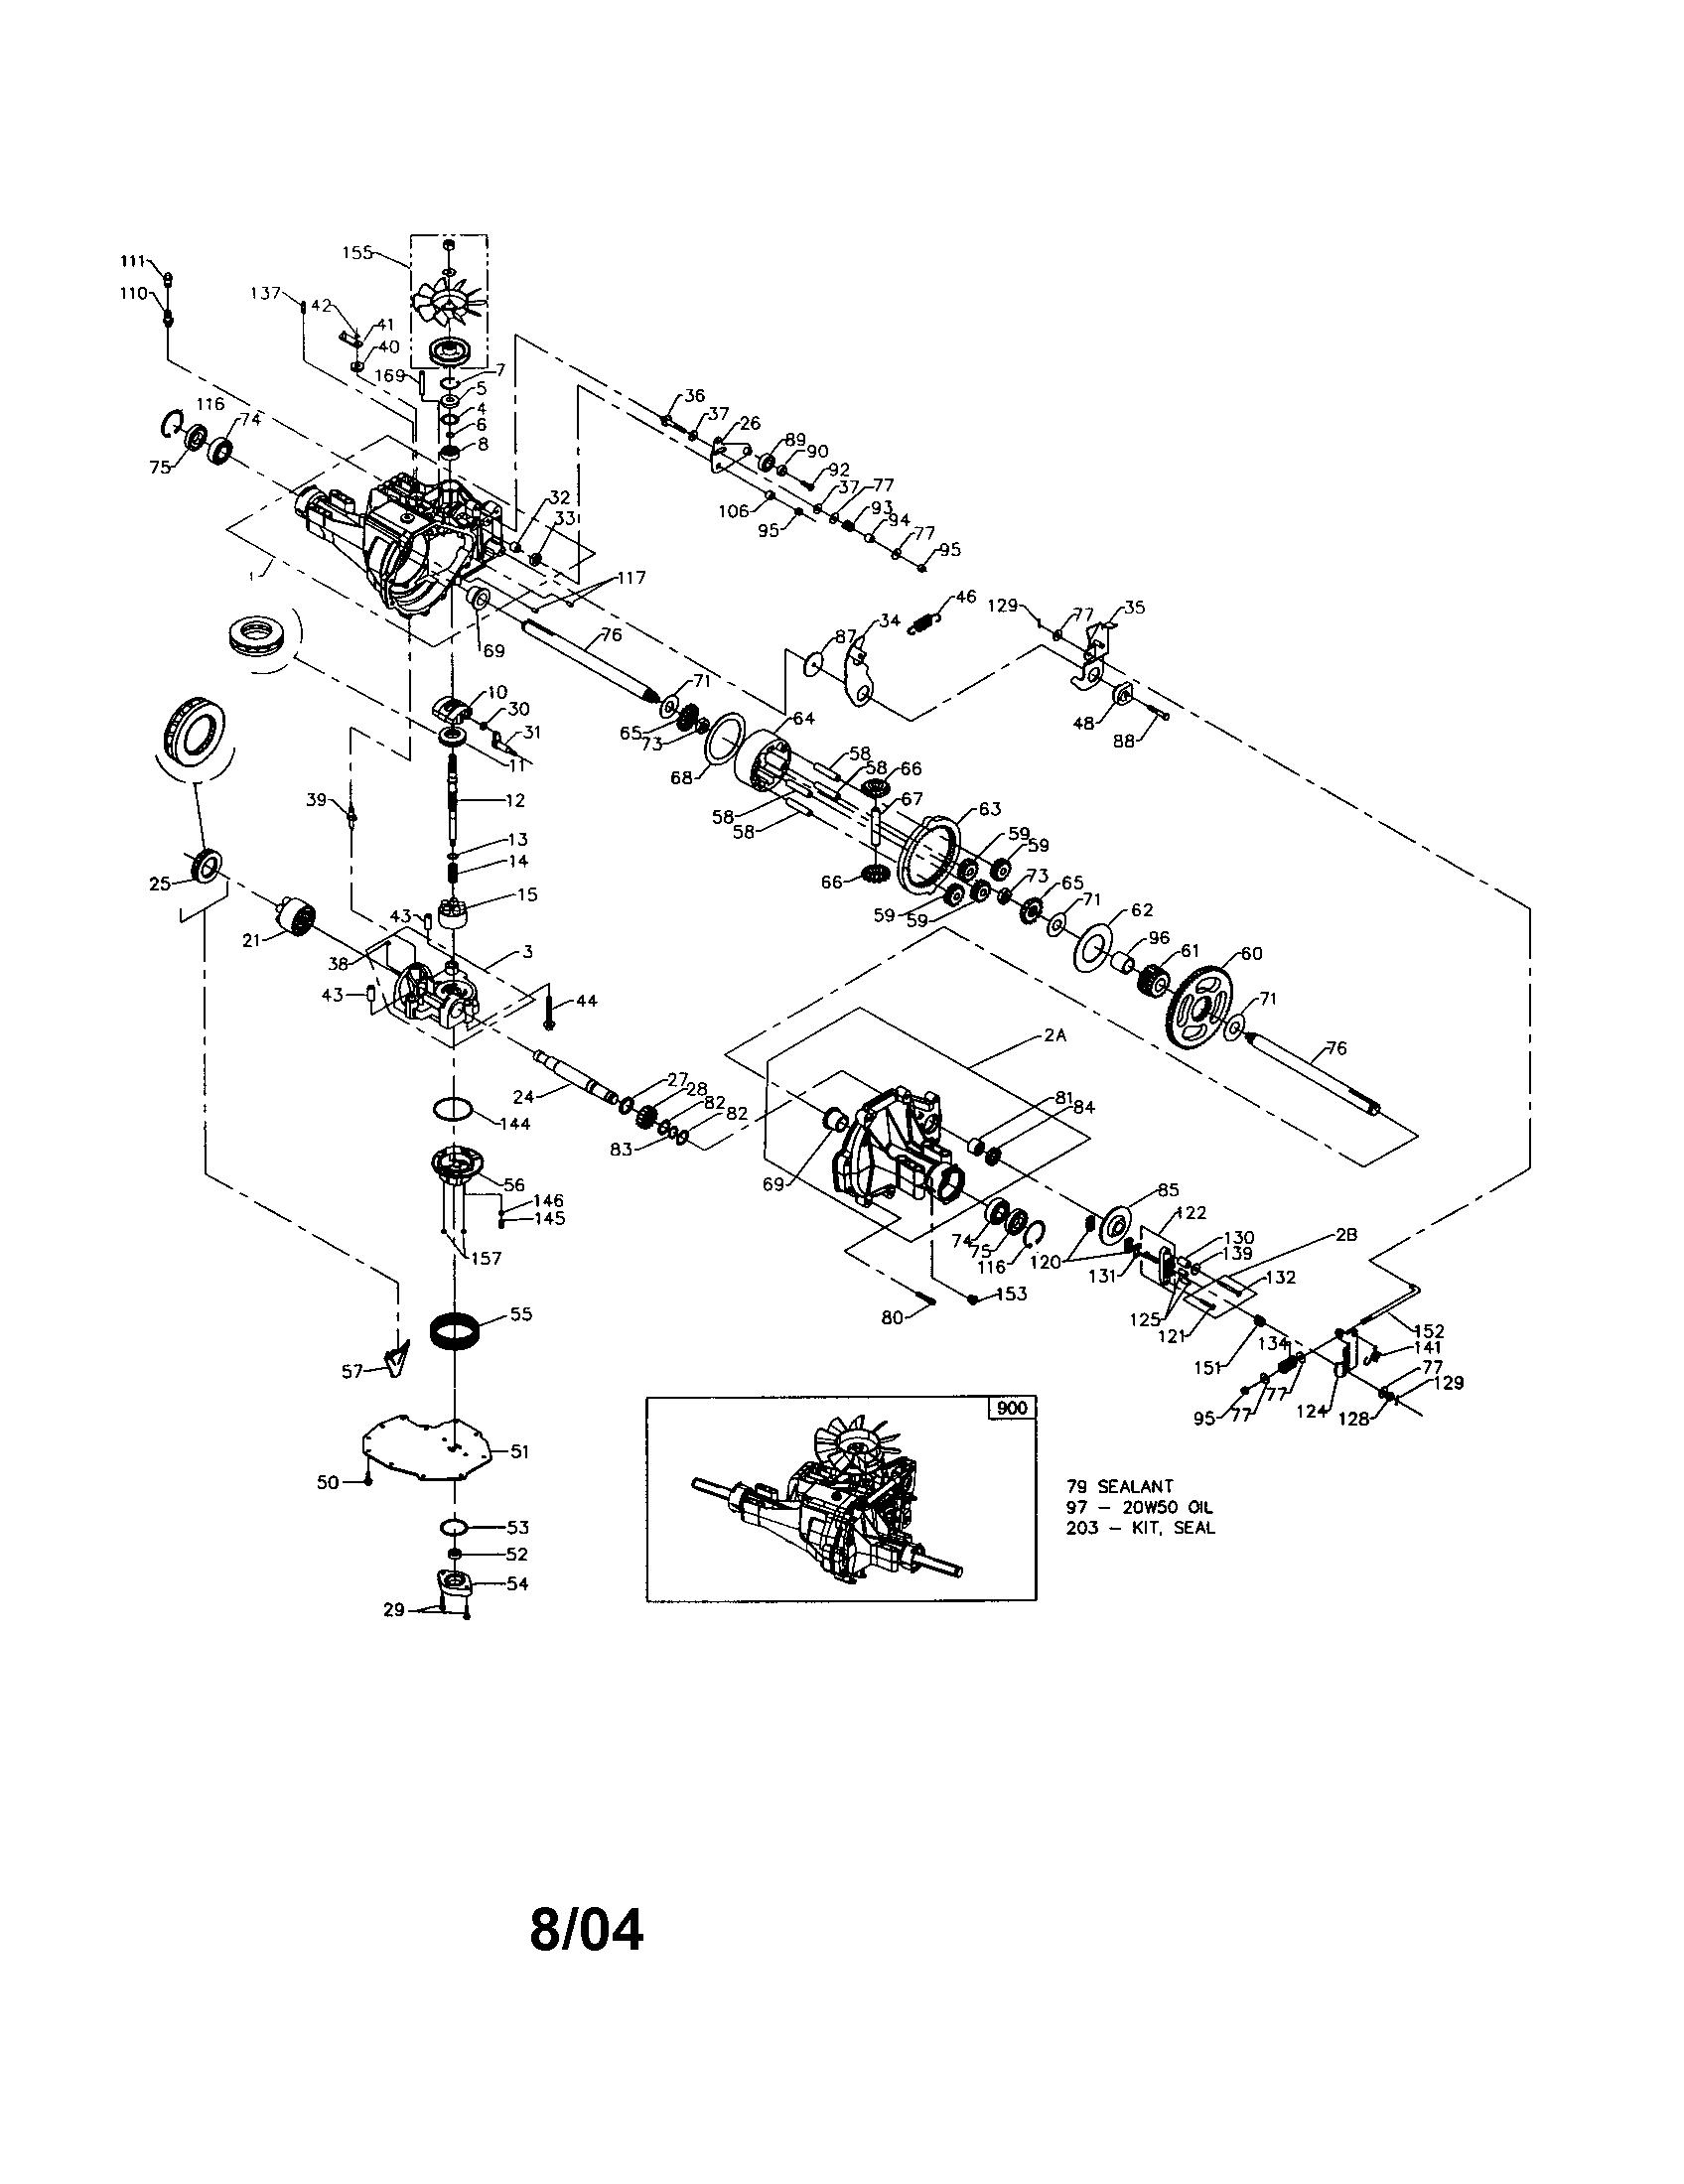 Detailed Wiring Diagram 917.288070 Lawn Mower